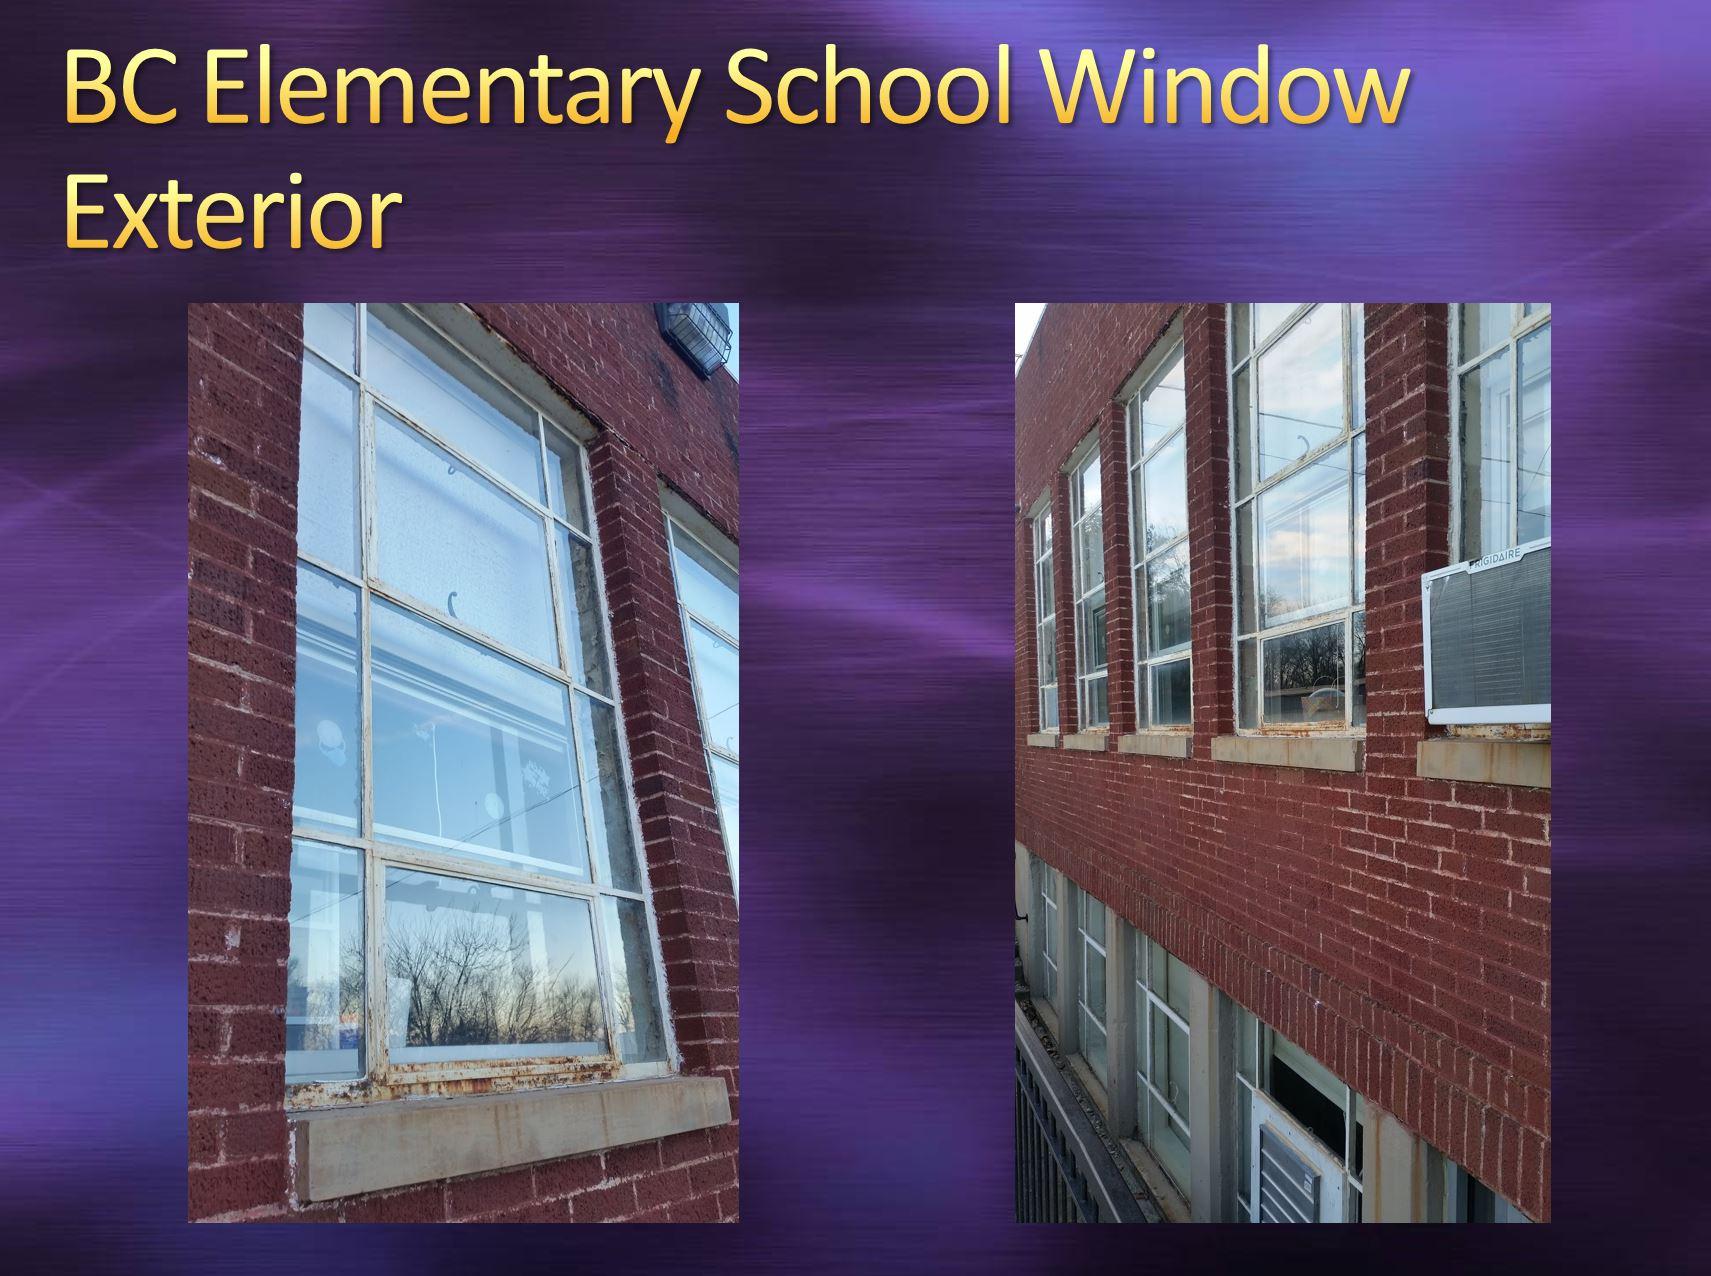 BC Elementary School Window Exterior View